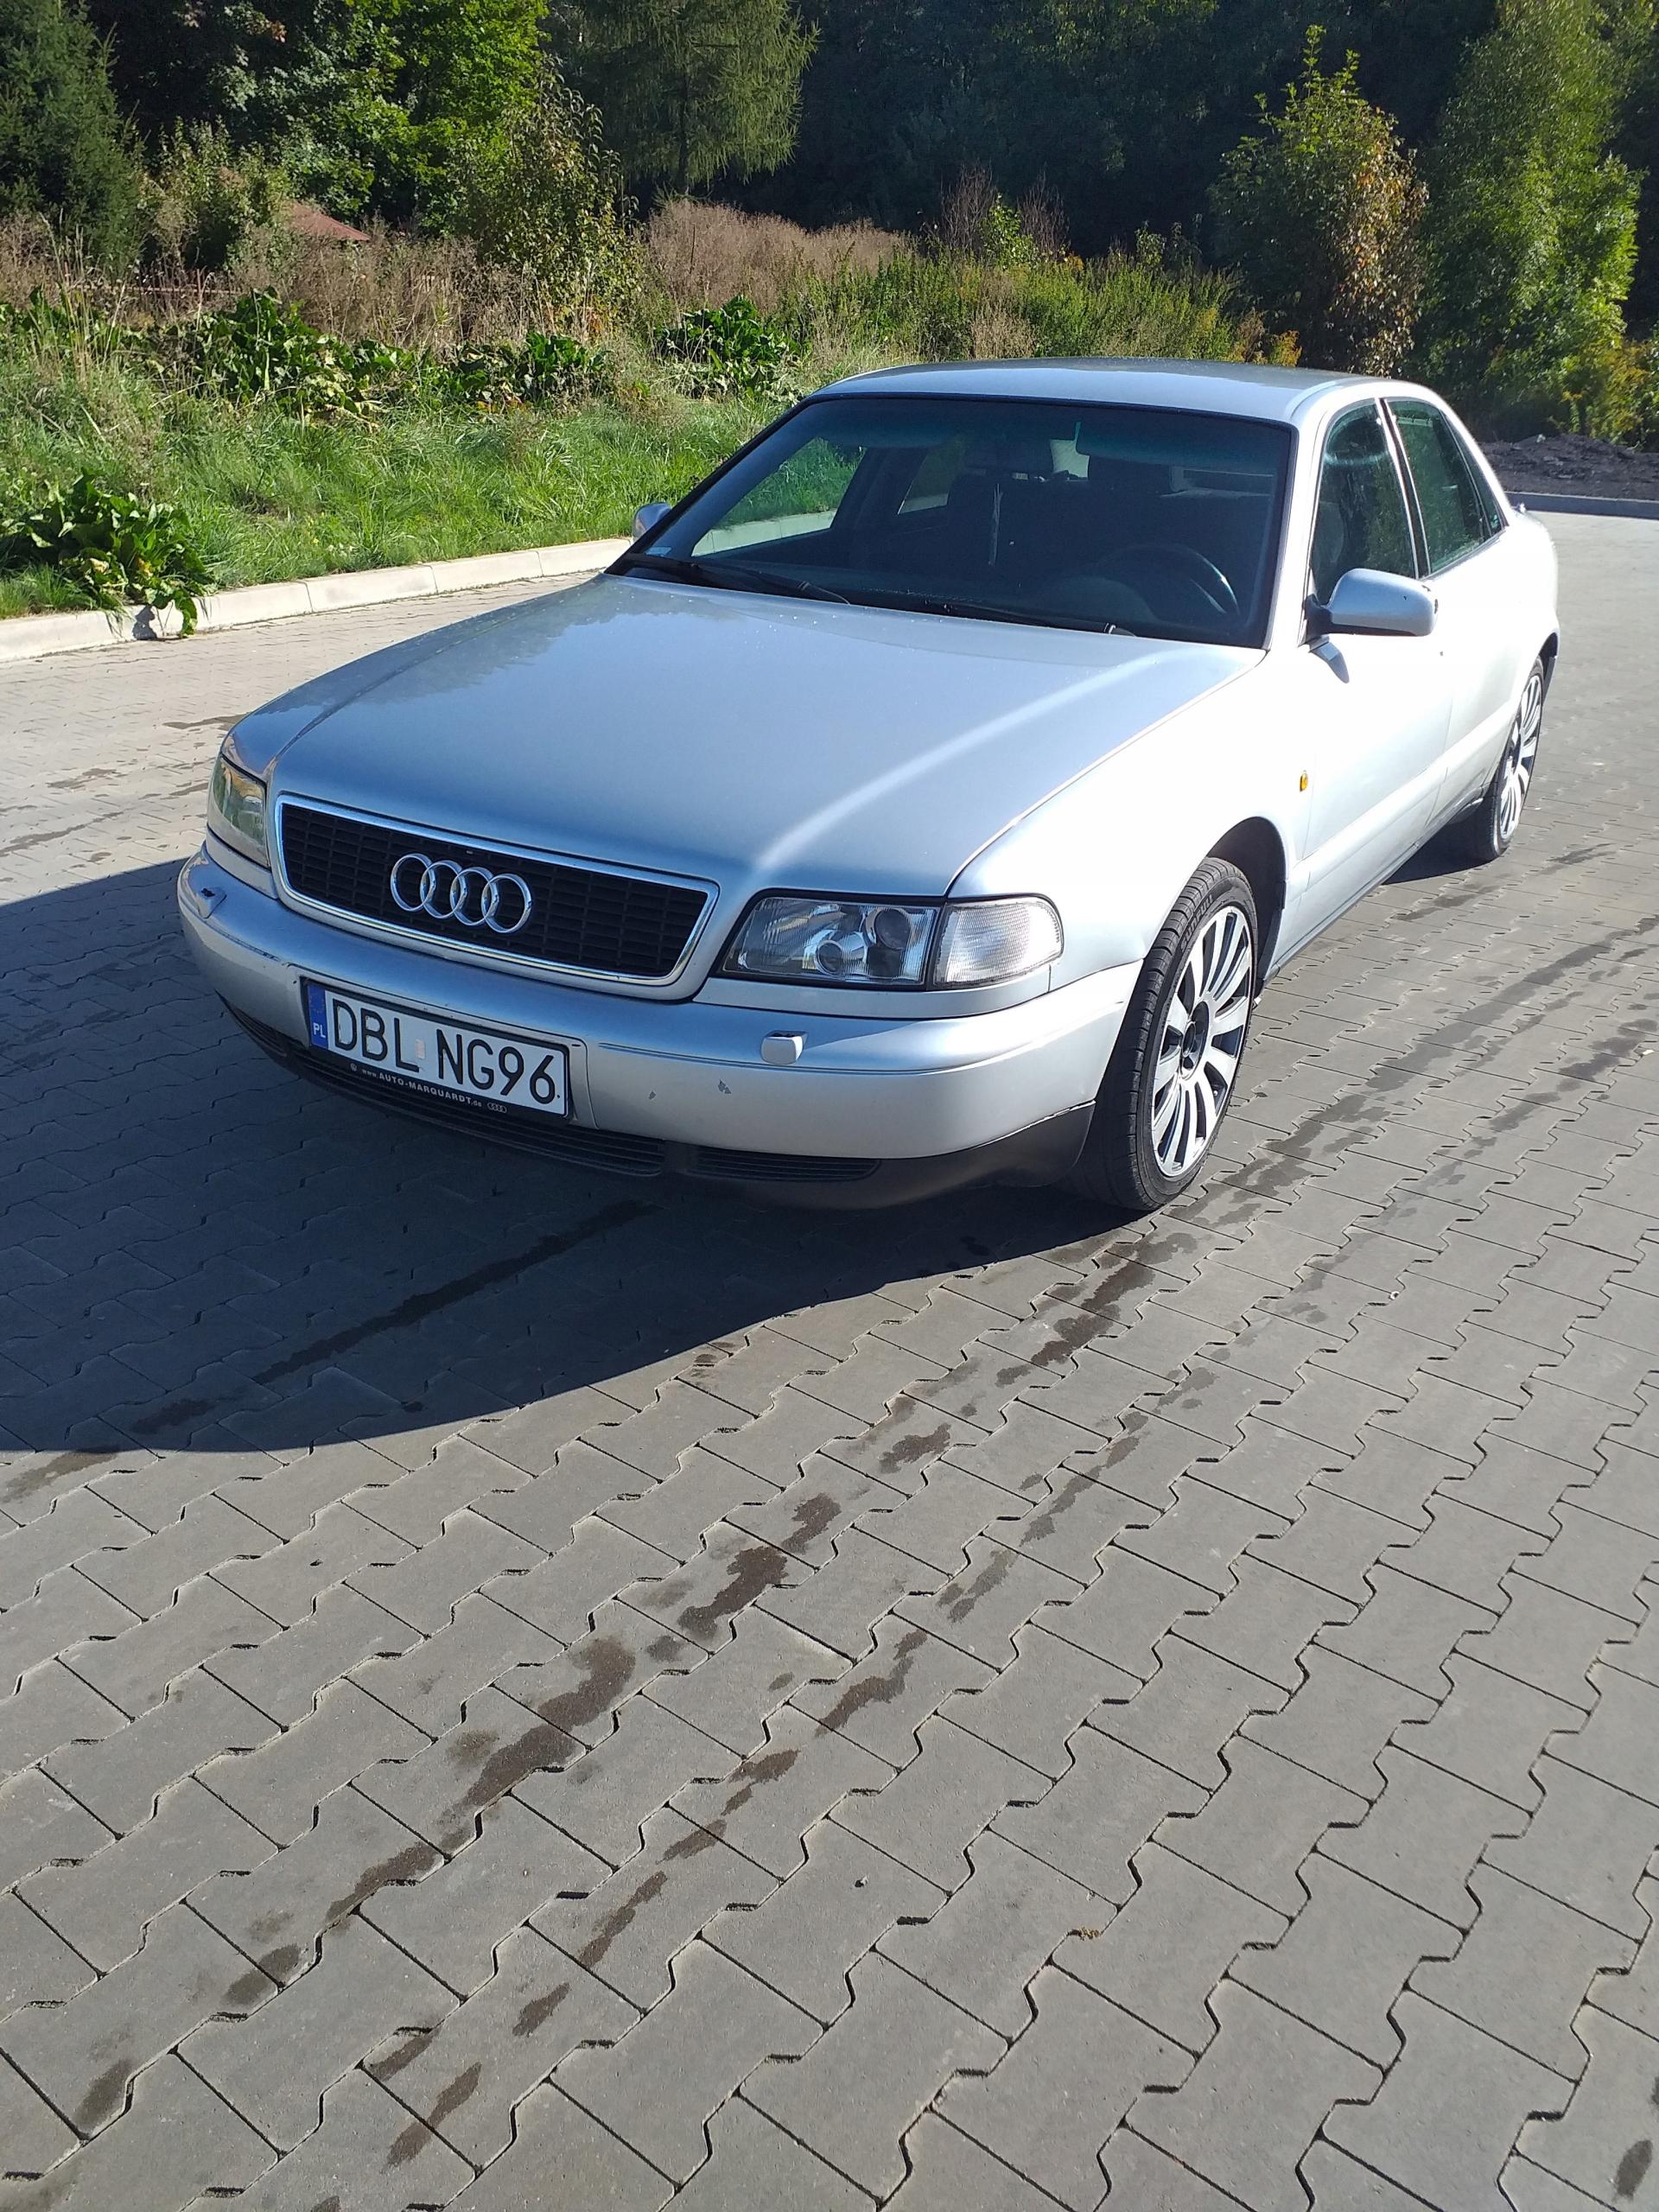 AUDI A8 2 5 Tdi V6 98r Zl...